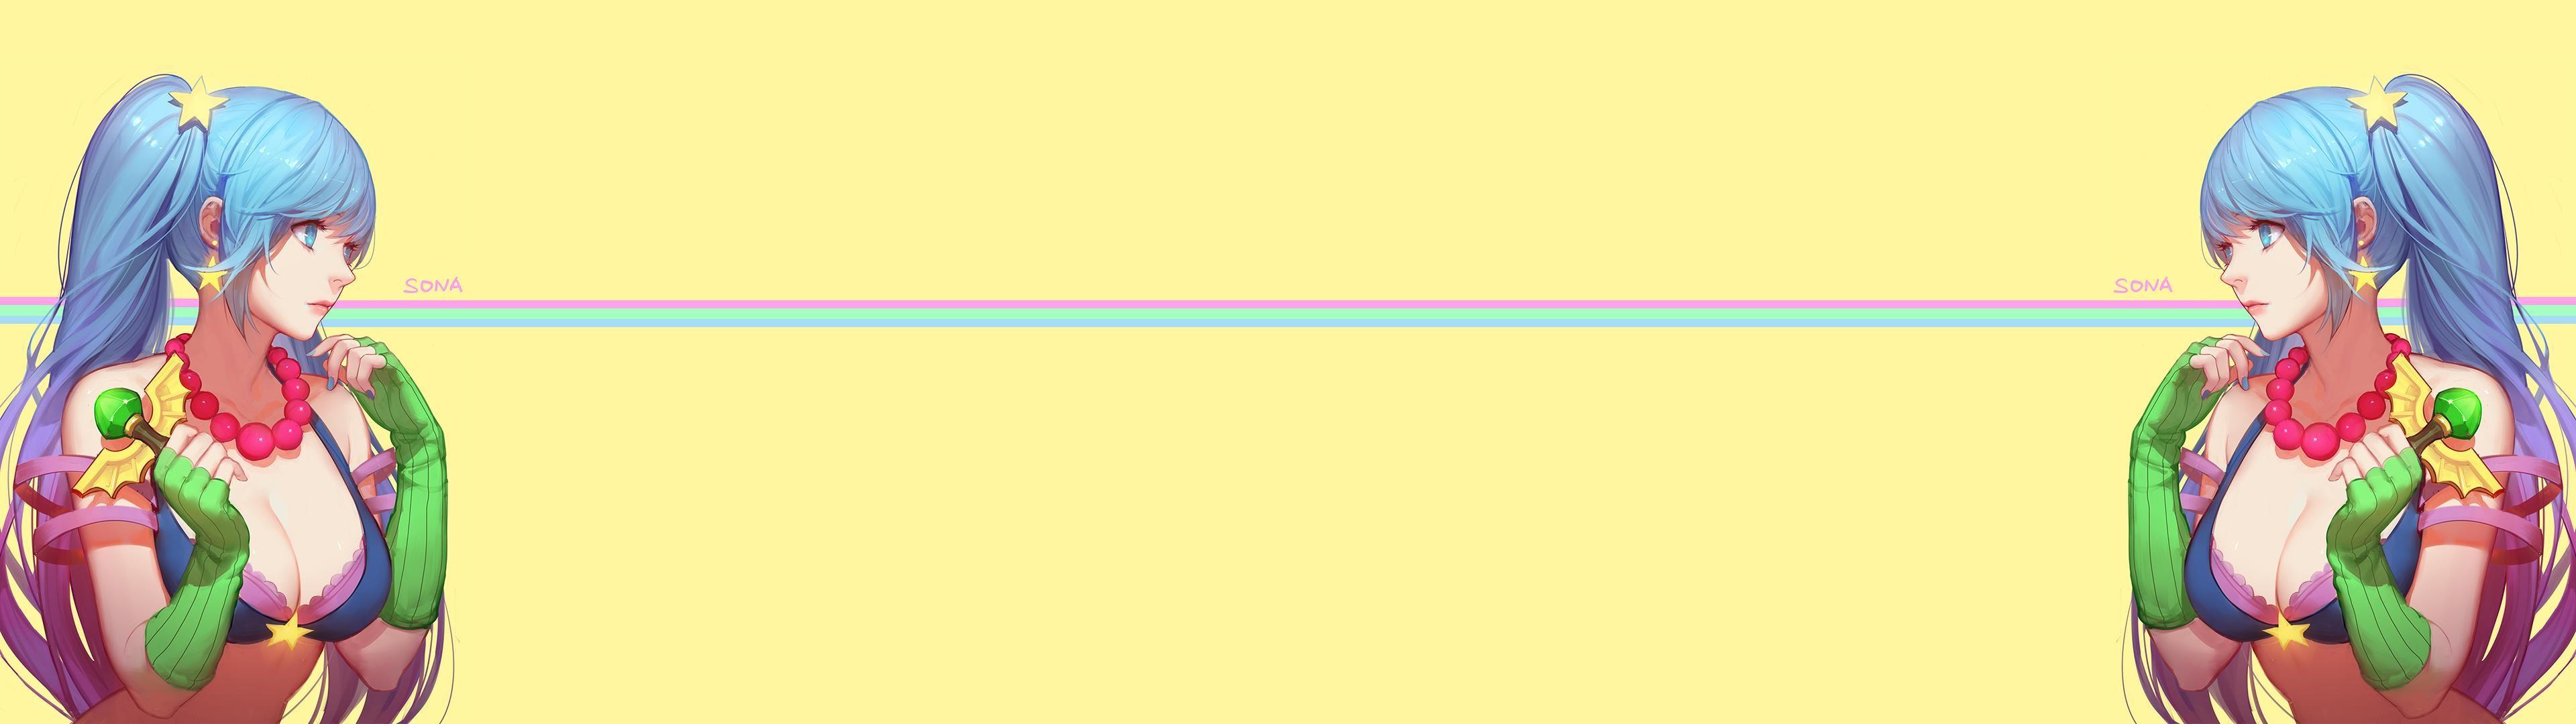 Dual Monitor (3840×1080) – https://i.imgur.com/xwiDJmF.jpg